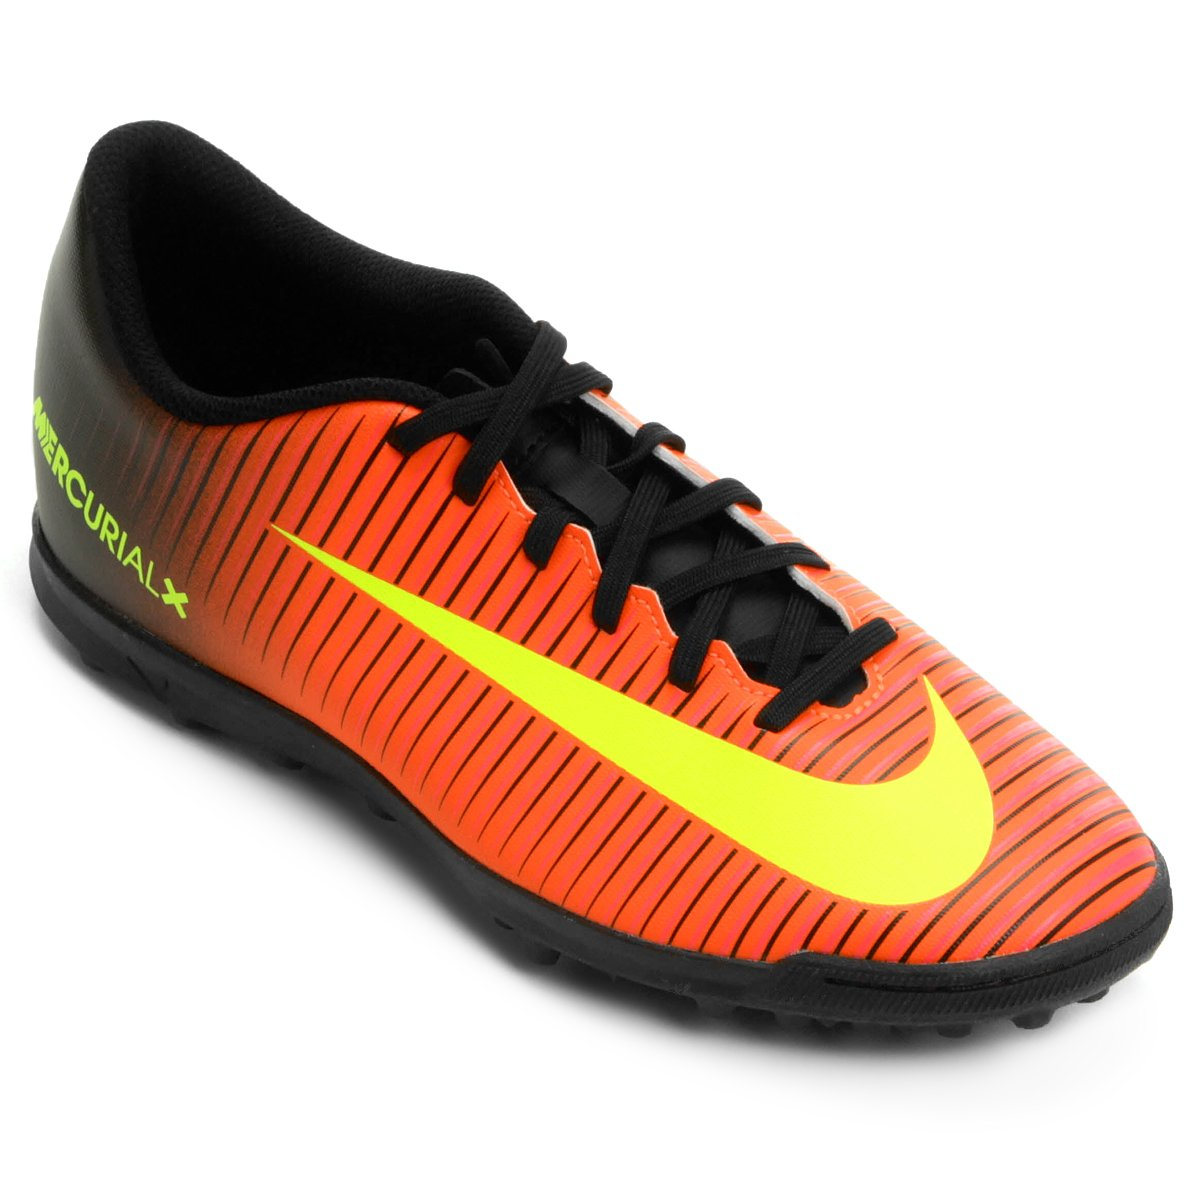 Chuteira Society Nike Mercurial Vortex 3 TF Masculina - Laranja e ... 2bff6ed1772cd